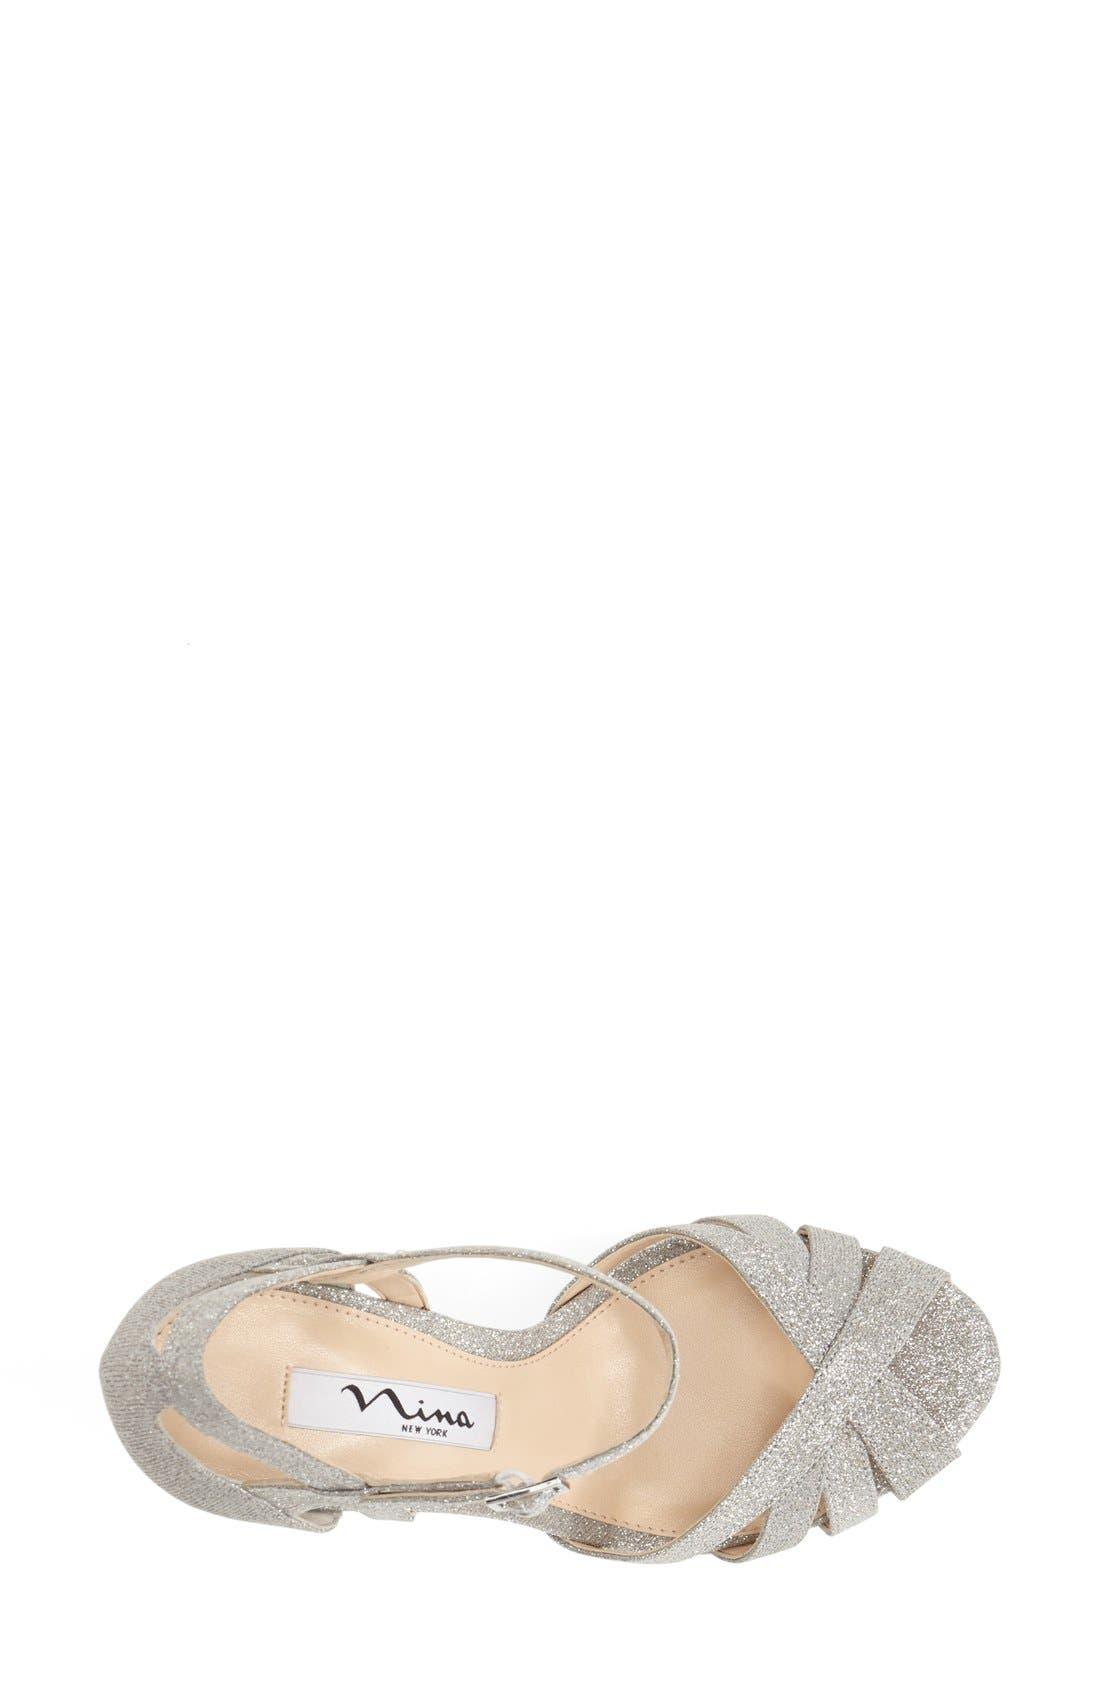 NINA, 'Senora' Glitter Satin Sandal, Alternate thumbnail 3, color, 042